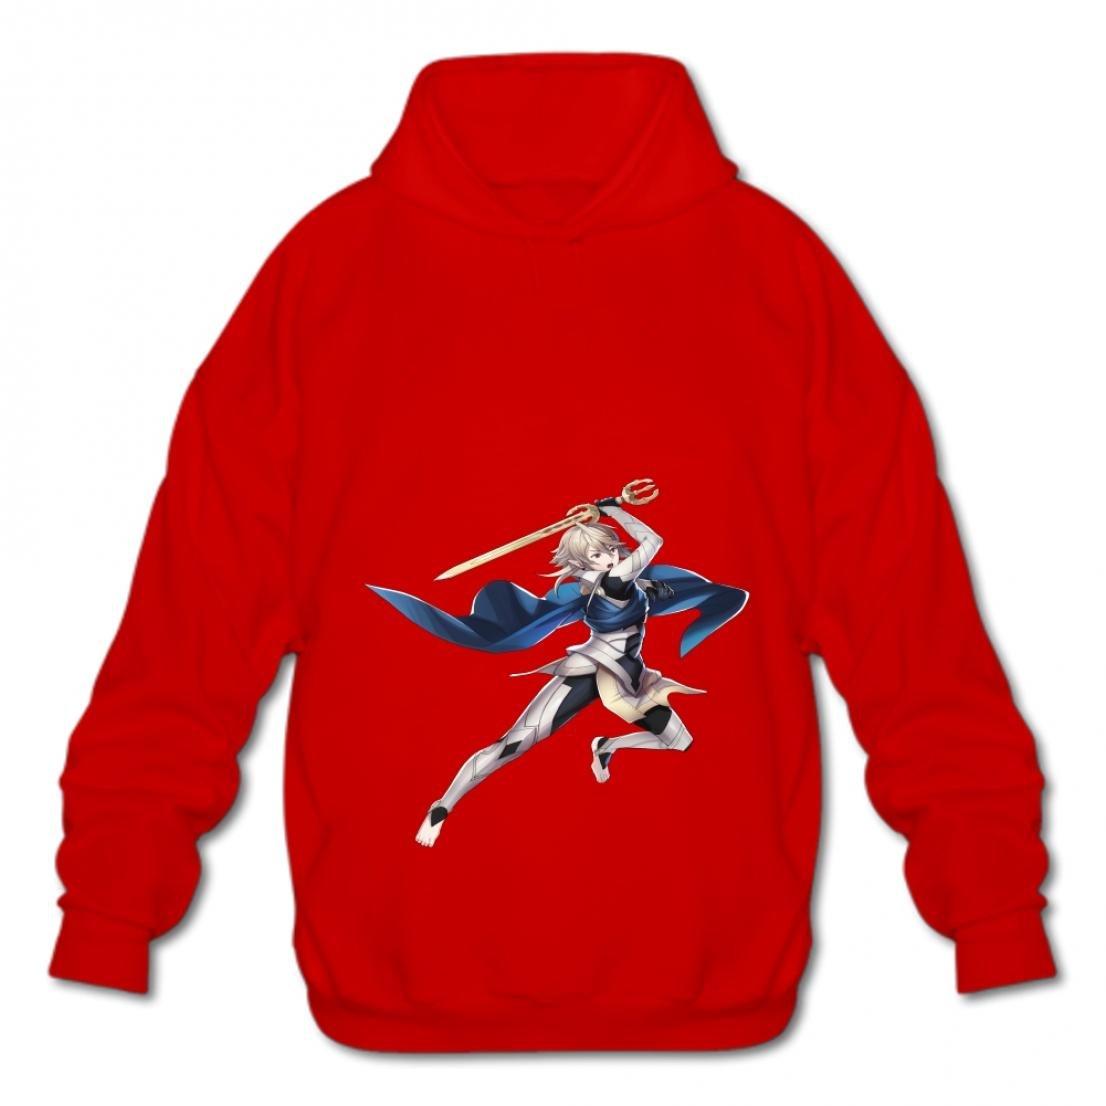 Tngjijish Fashion Hoodies-03 Cartoon Fire gdew Hoodies Mens Cotton Pullover Fashion Sweatshirt